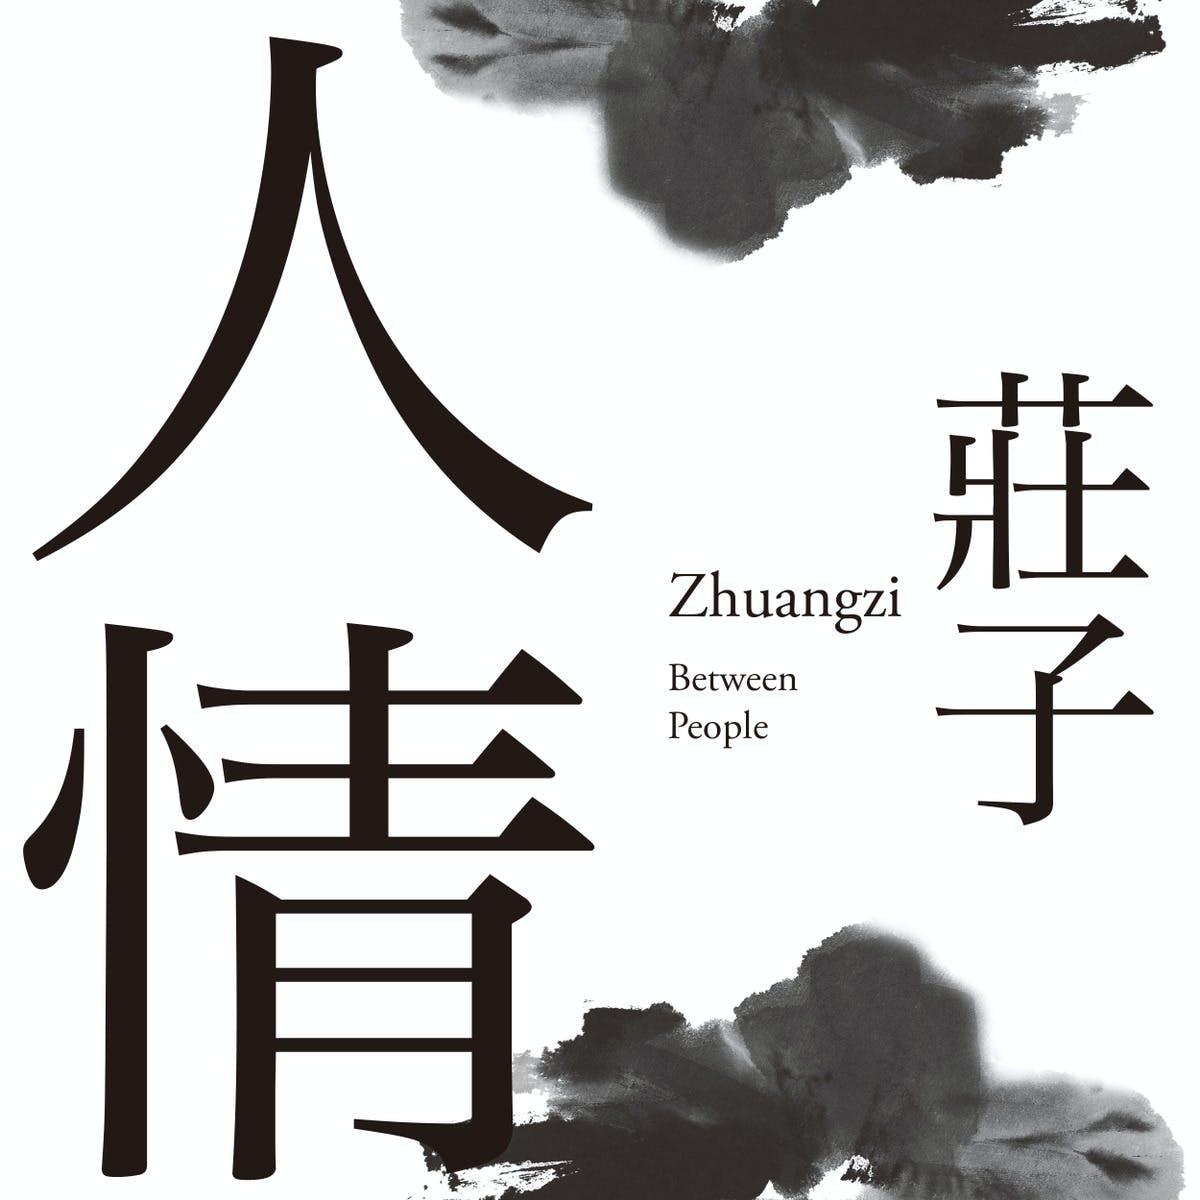 莊子─人情 (Zhuangzi─Between People)